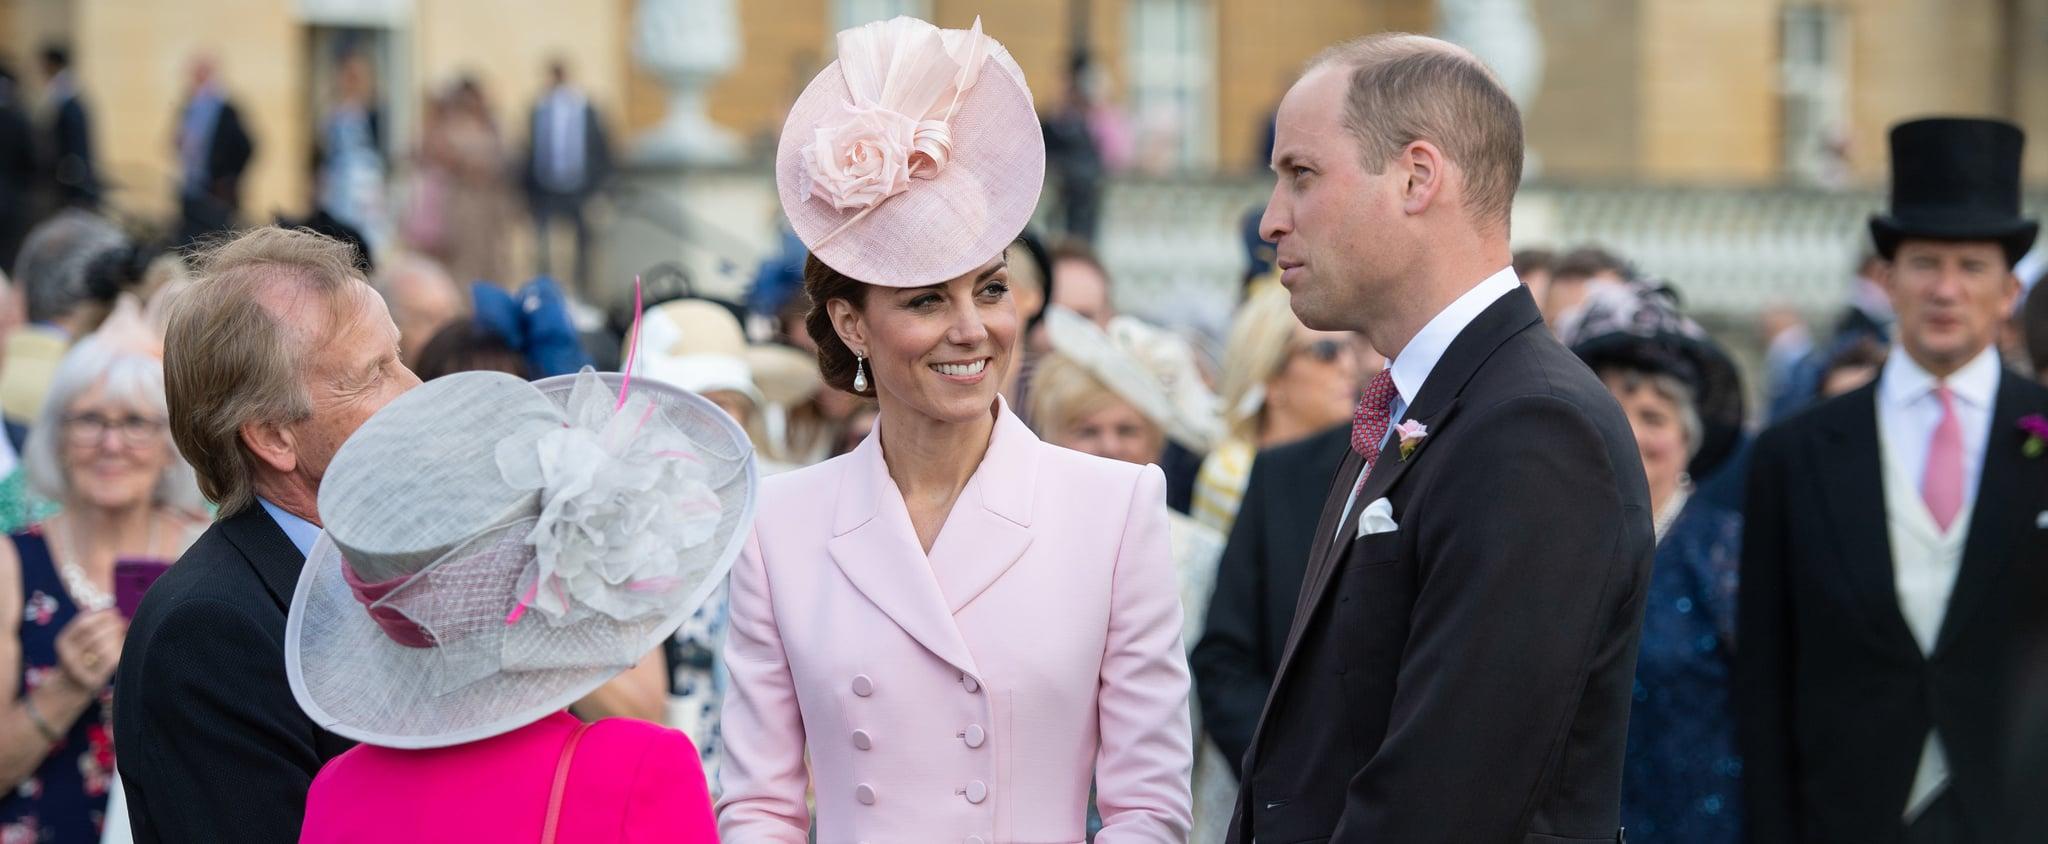 Kate Middleton Pink Alexander McQueen Coat Dress May 2019